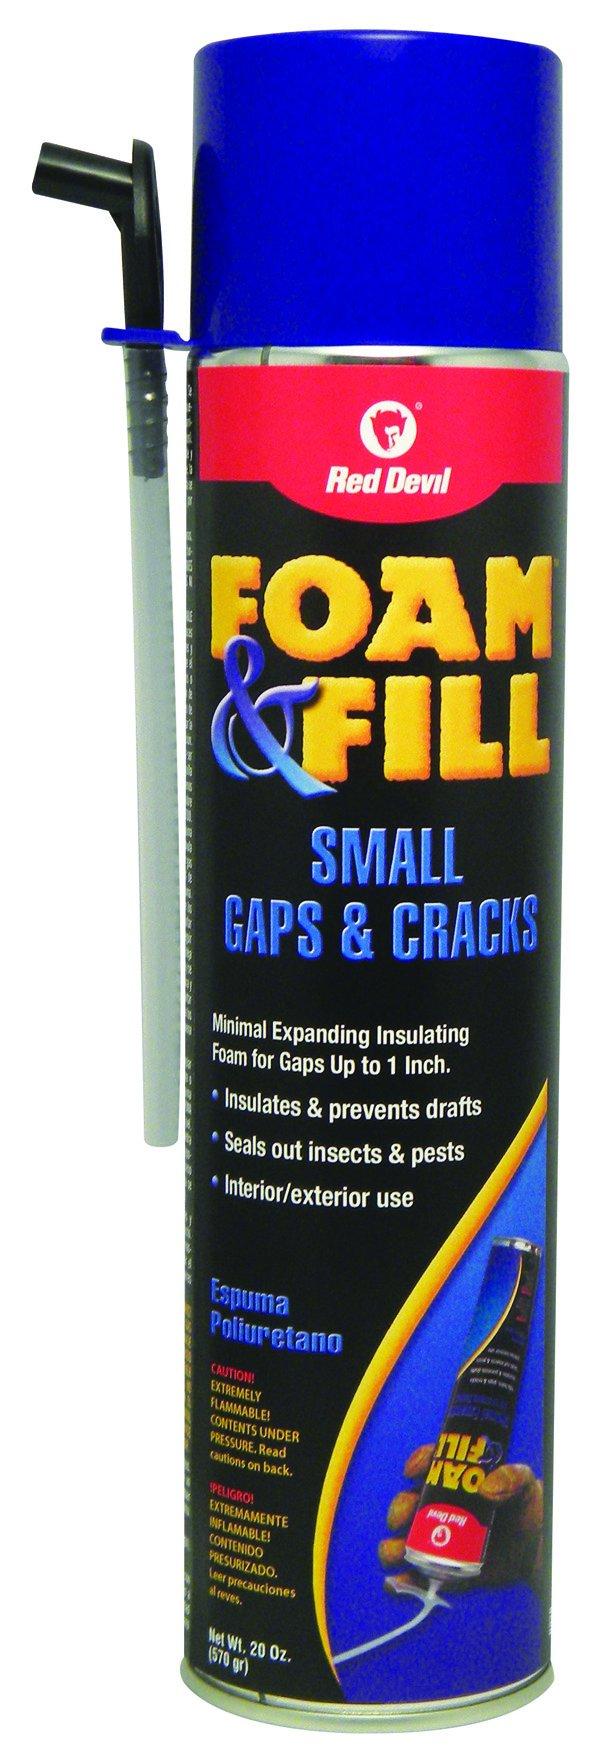 Red Devil 0920 Foam & Fill Small Gaps & Cracks Expanding Polyurethane Foam Sealant, 20-Ounce, Off White